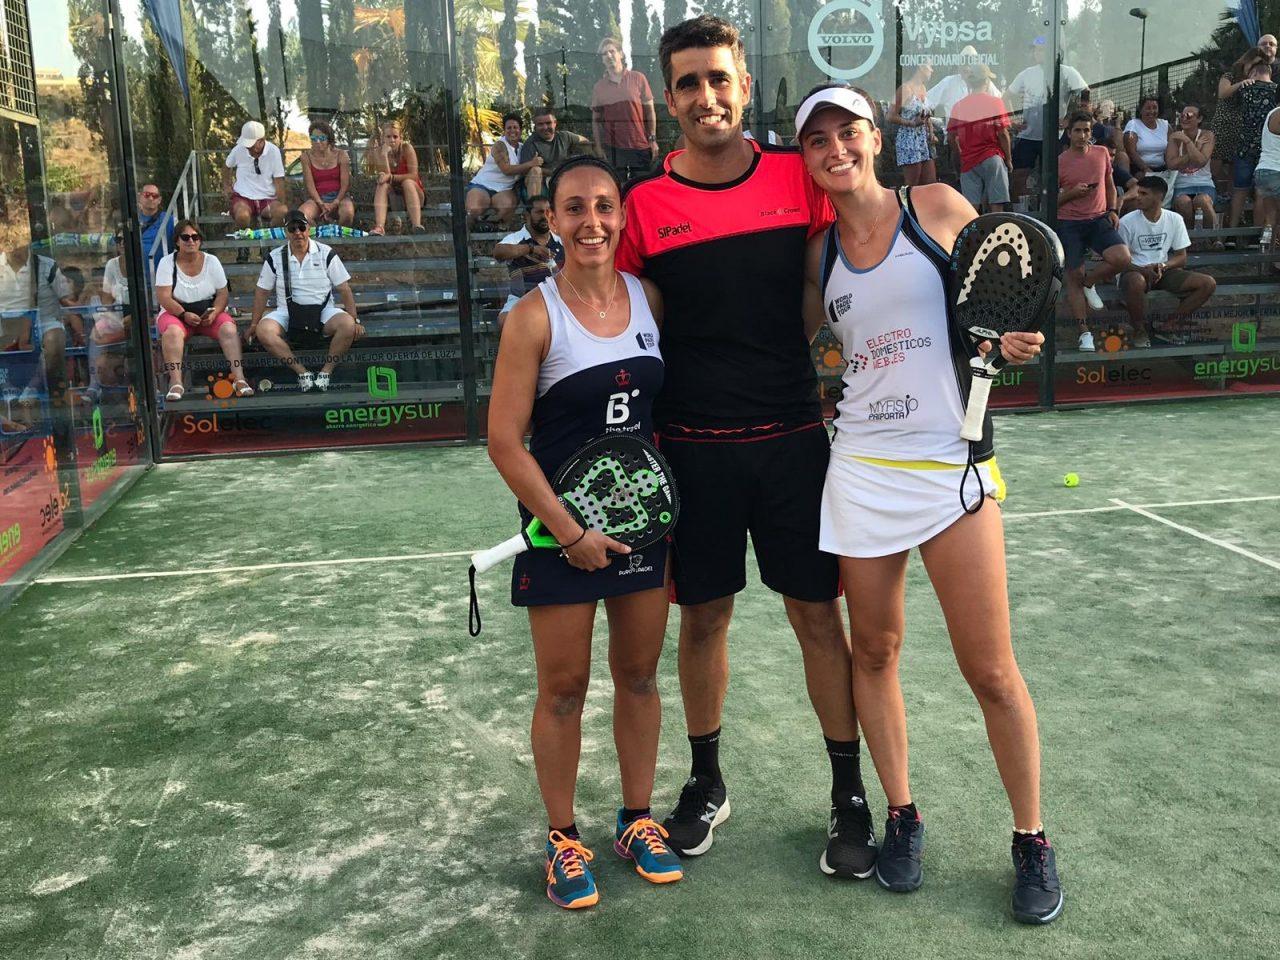 Sandra-hernandez-tamara-icardo-octavos-femeninos-cervezas-victoria-mijas-open-2019